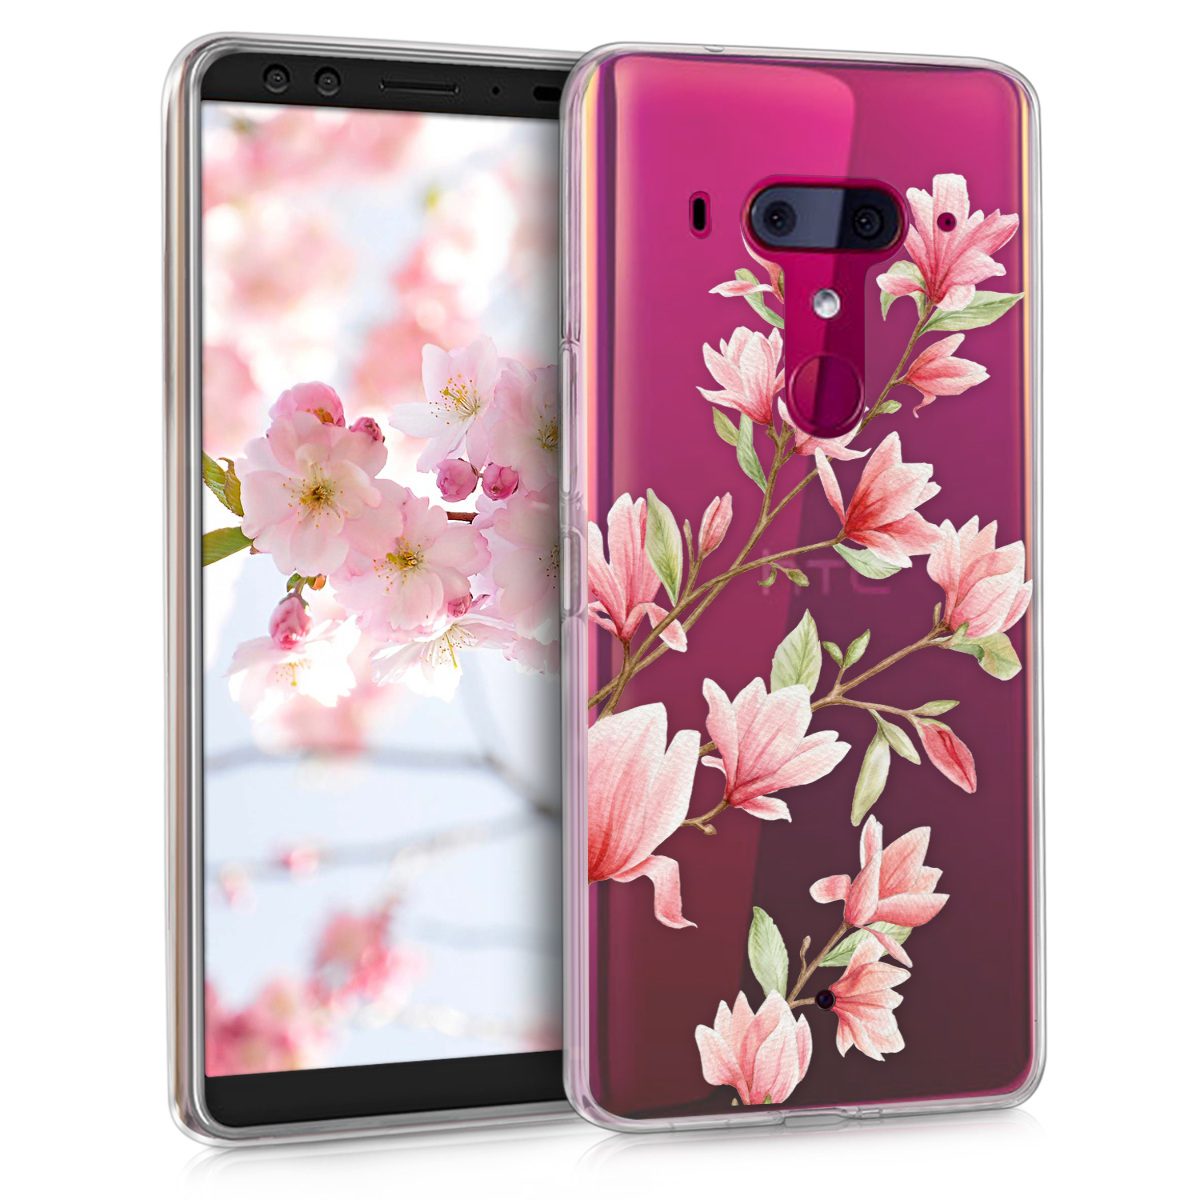 KW Θήκη Σιλικόνης HTC U12+ - Διάφανη με σχέδιο λουλουδιών (45293.02)